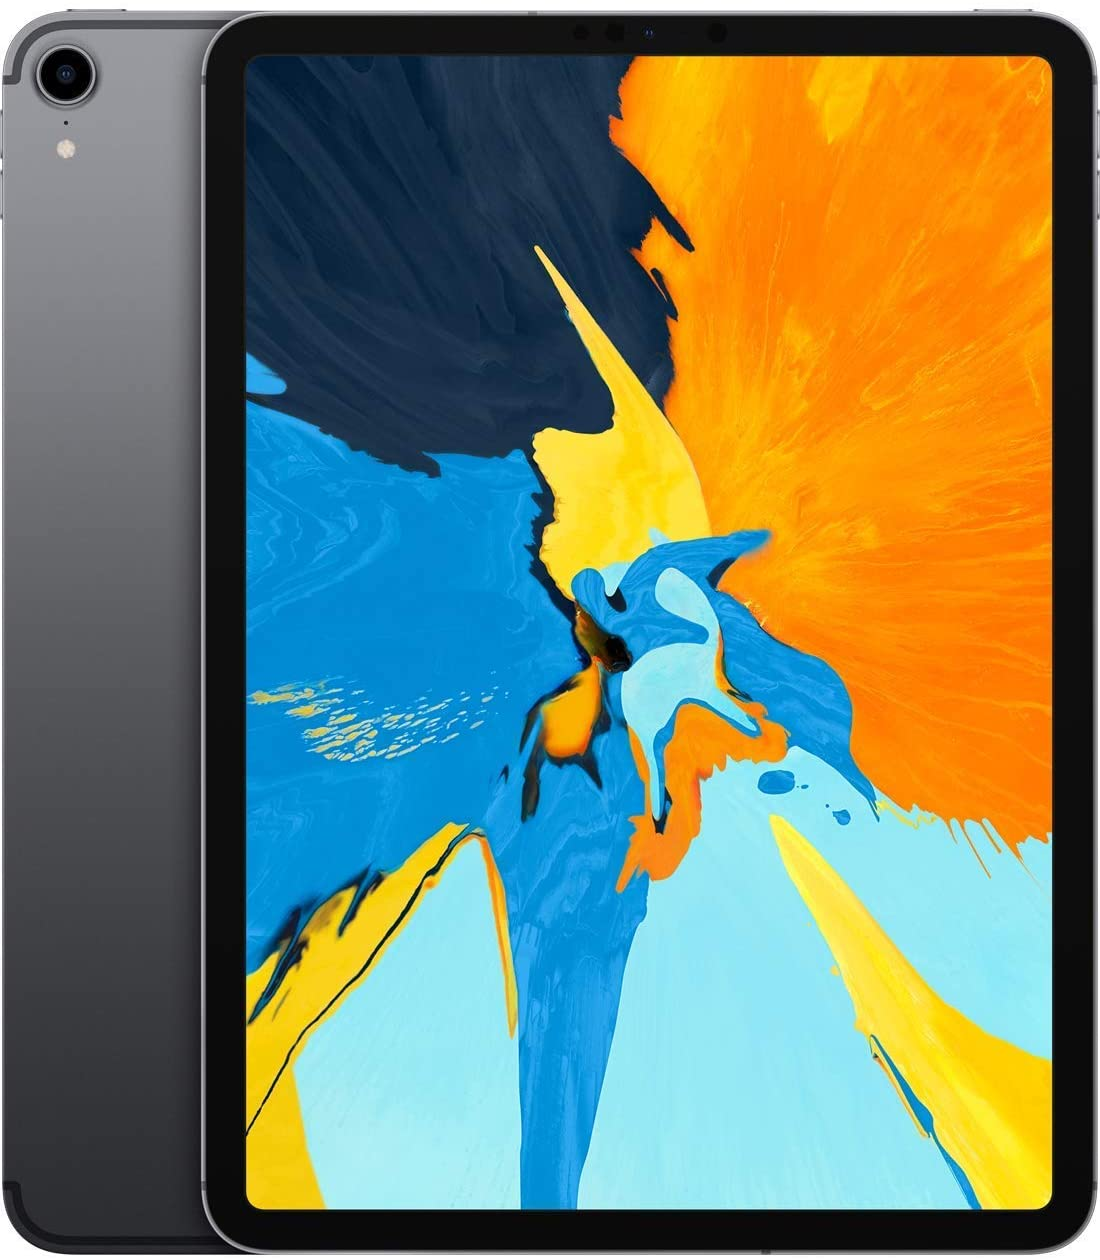 iPad Pro 11 (1st Generation)